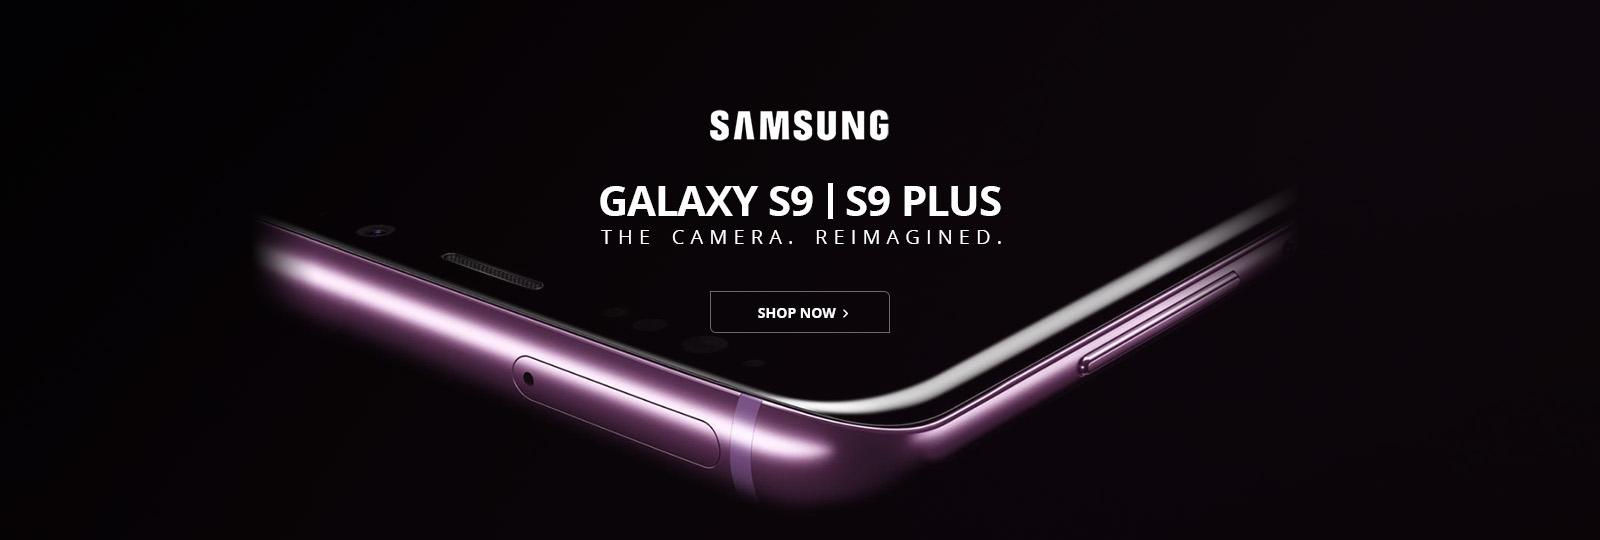 Samsung Galaxy 9 | 9 Plus